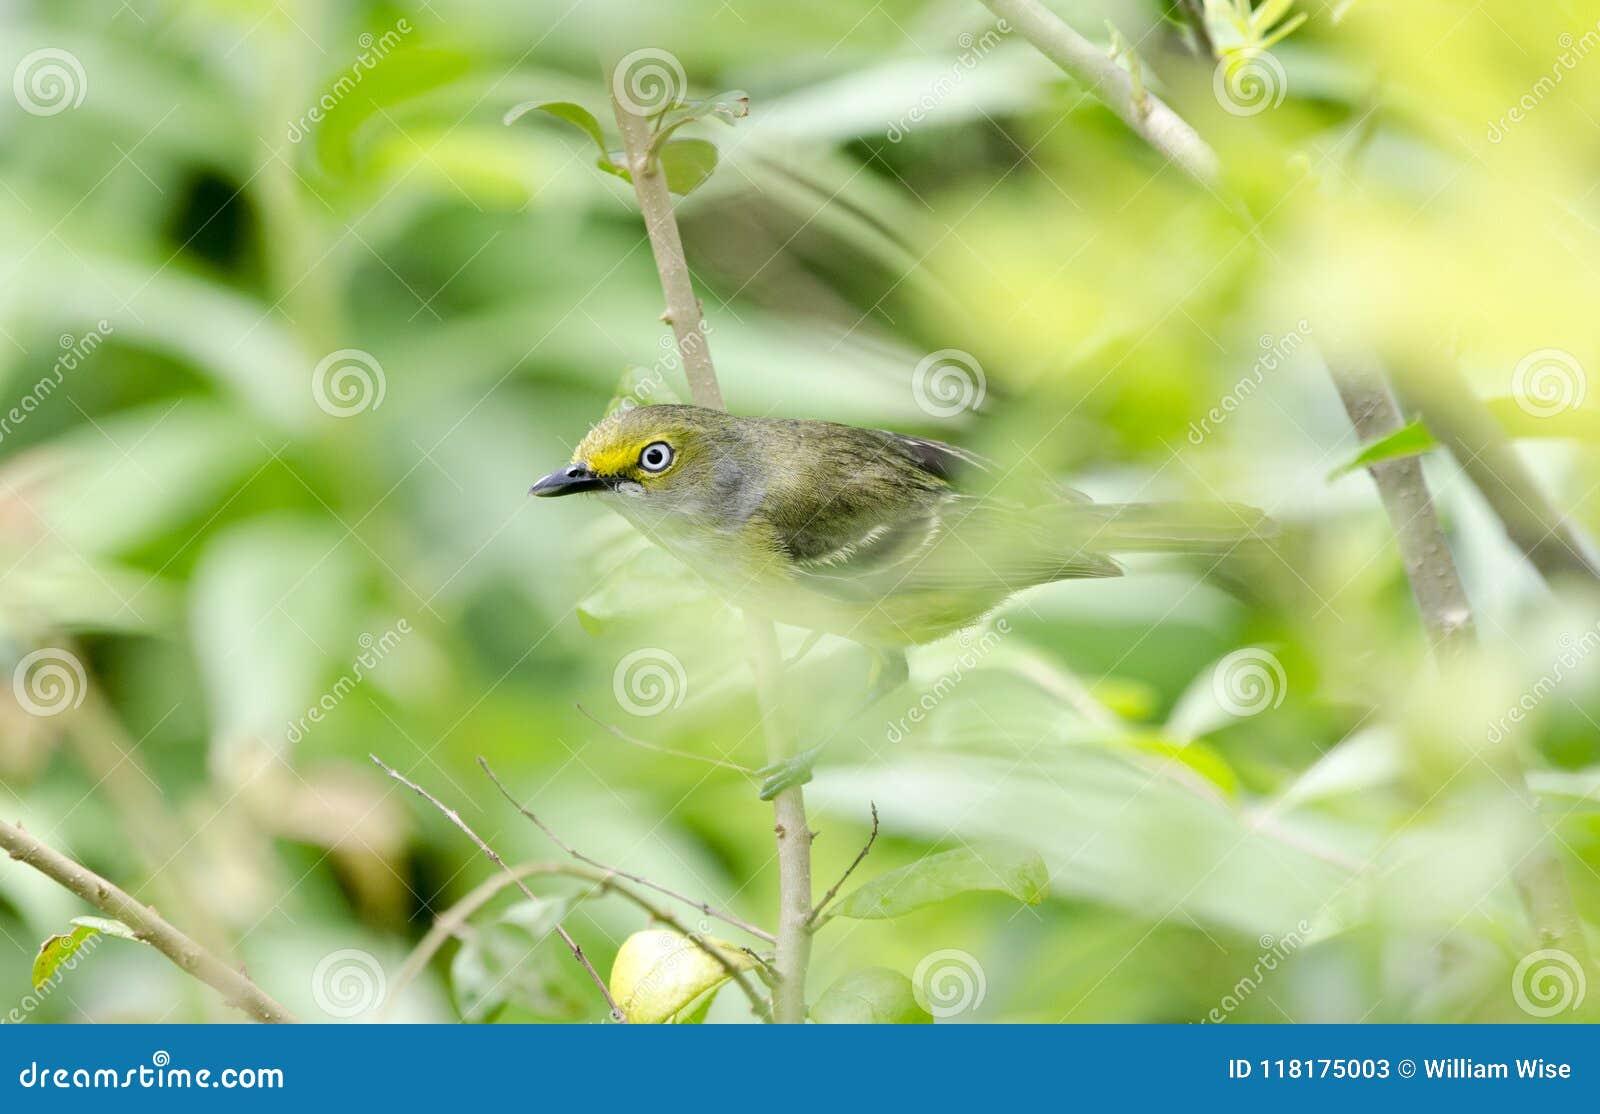 Heteyed Vireo-zangvogel zingen in Bradford Pear Tree, Georgië de V.S.